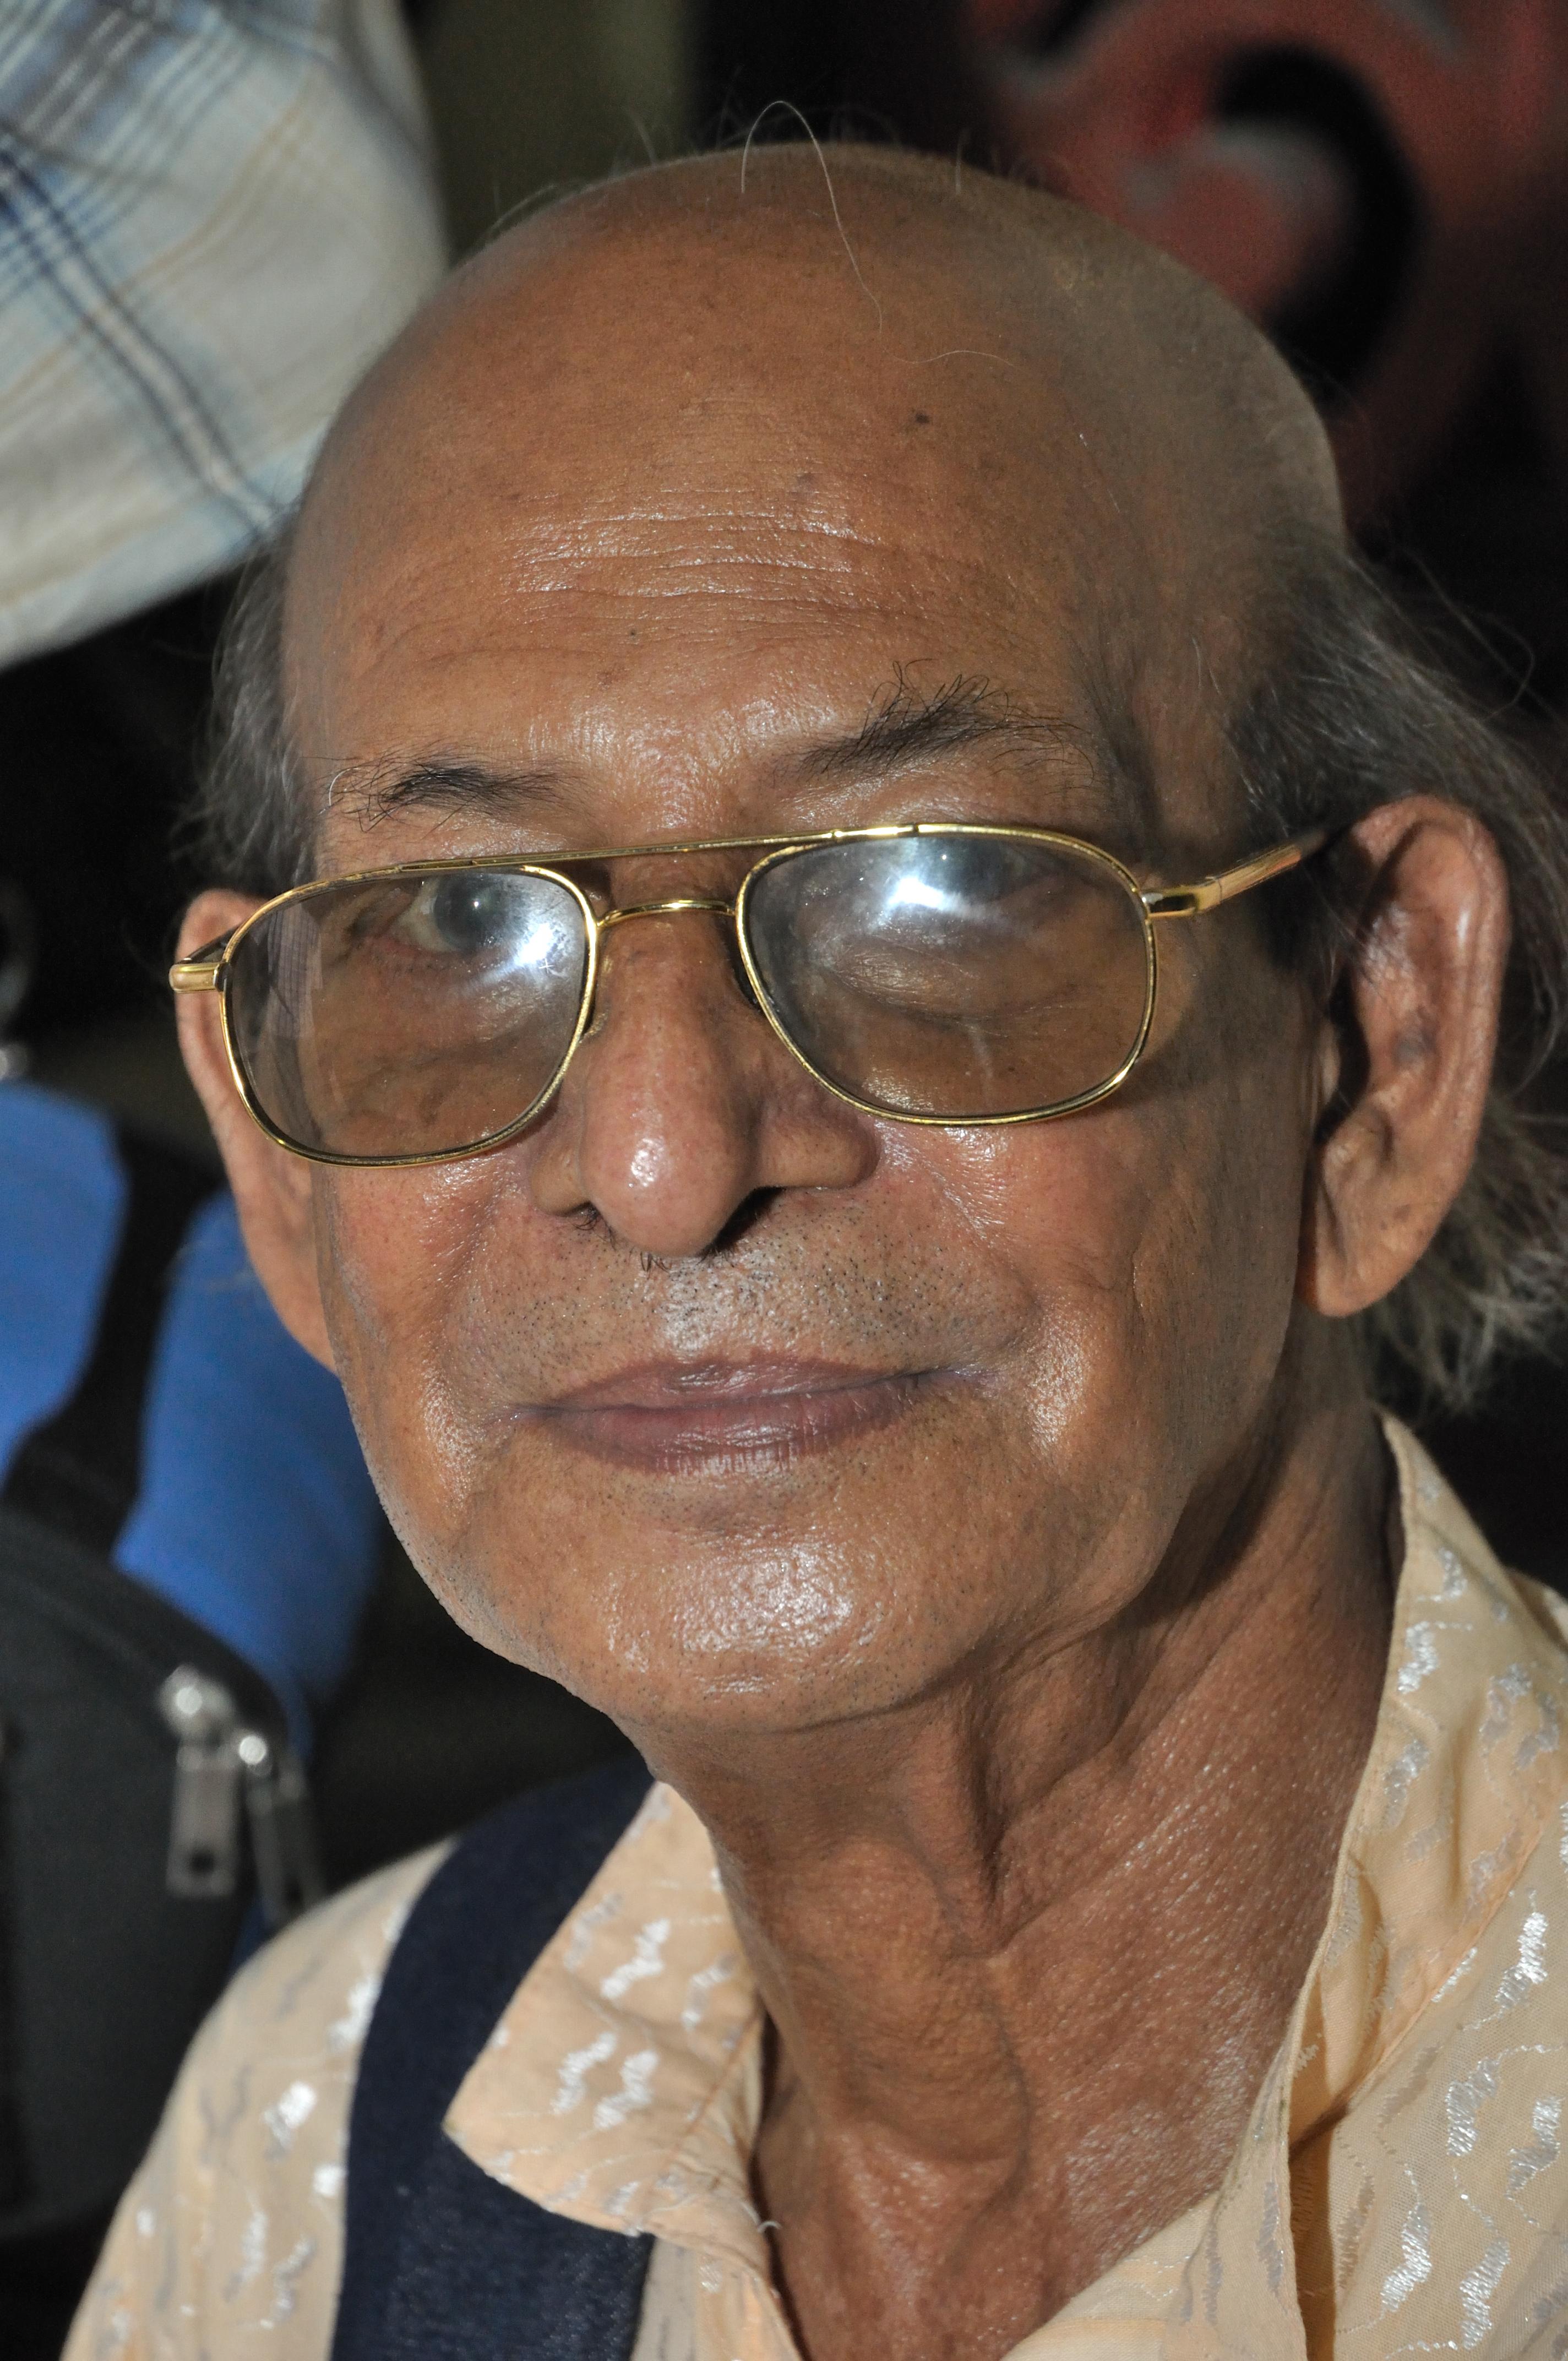 Image of Benu Sen from Wikidata